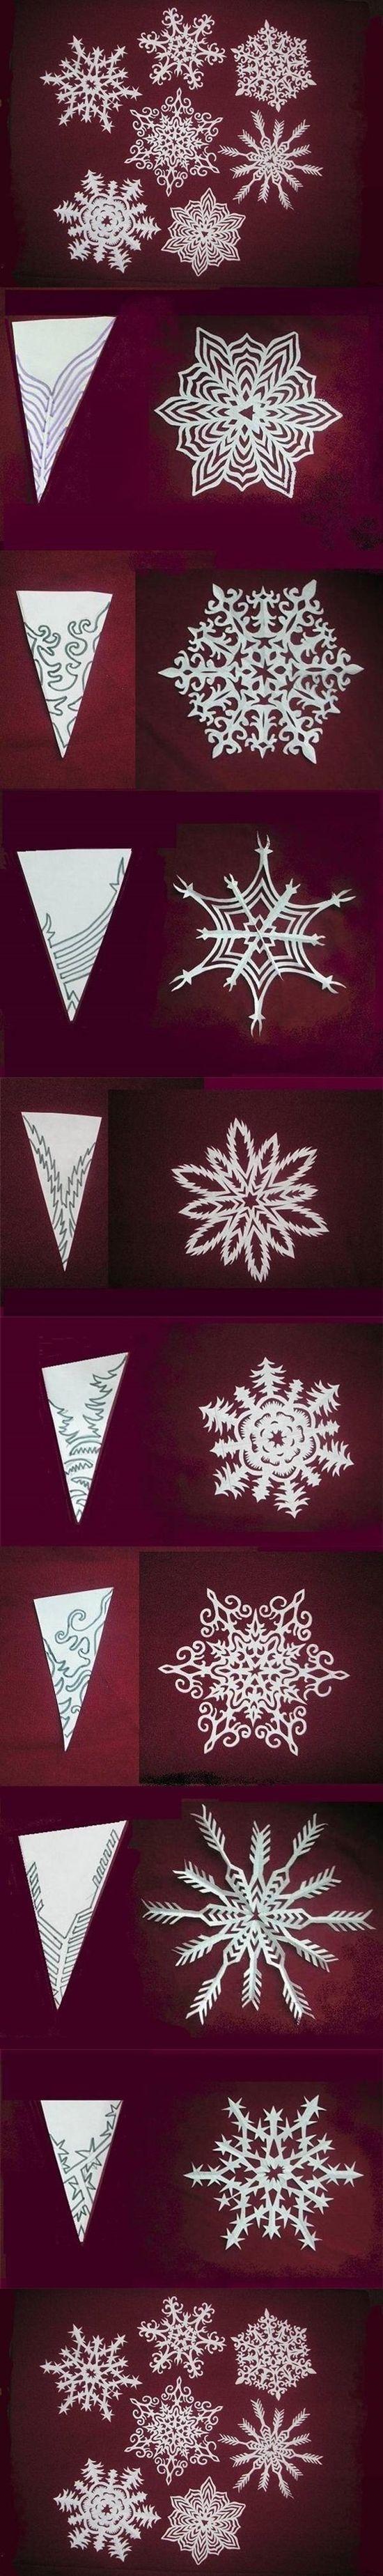 Wonderful diy paper snowflakes with pattern jewe blog for Diy snowflakes paper pattern